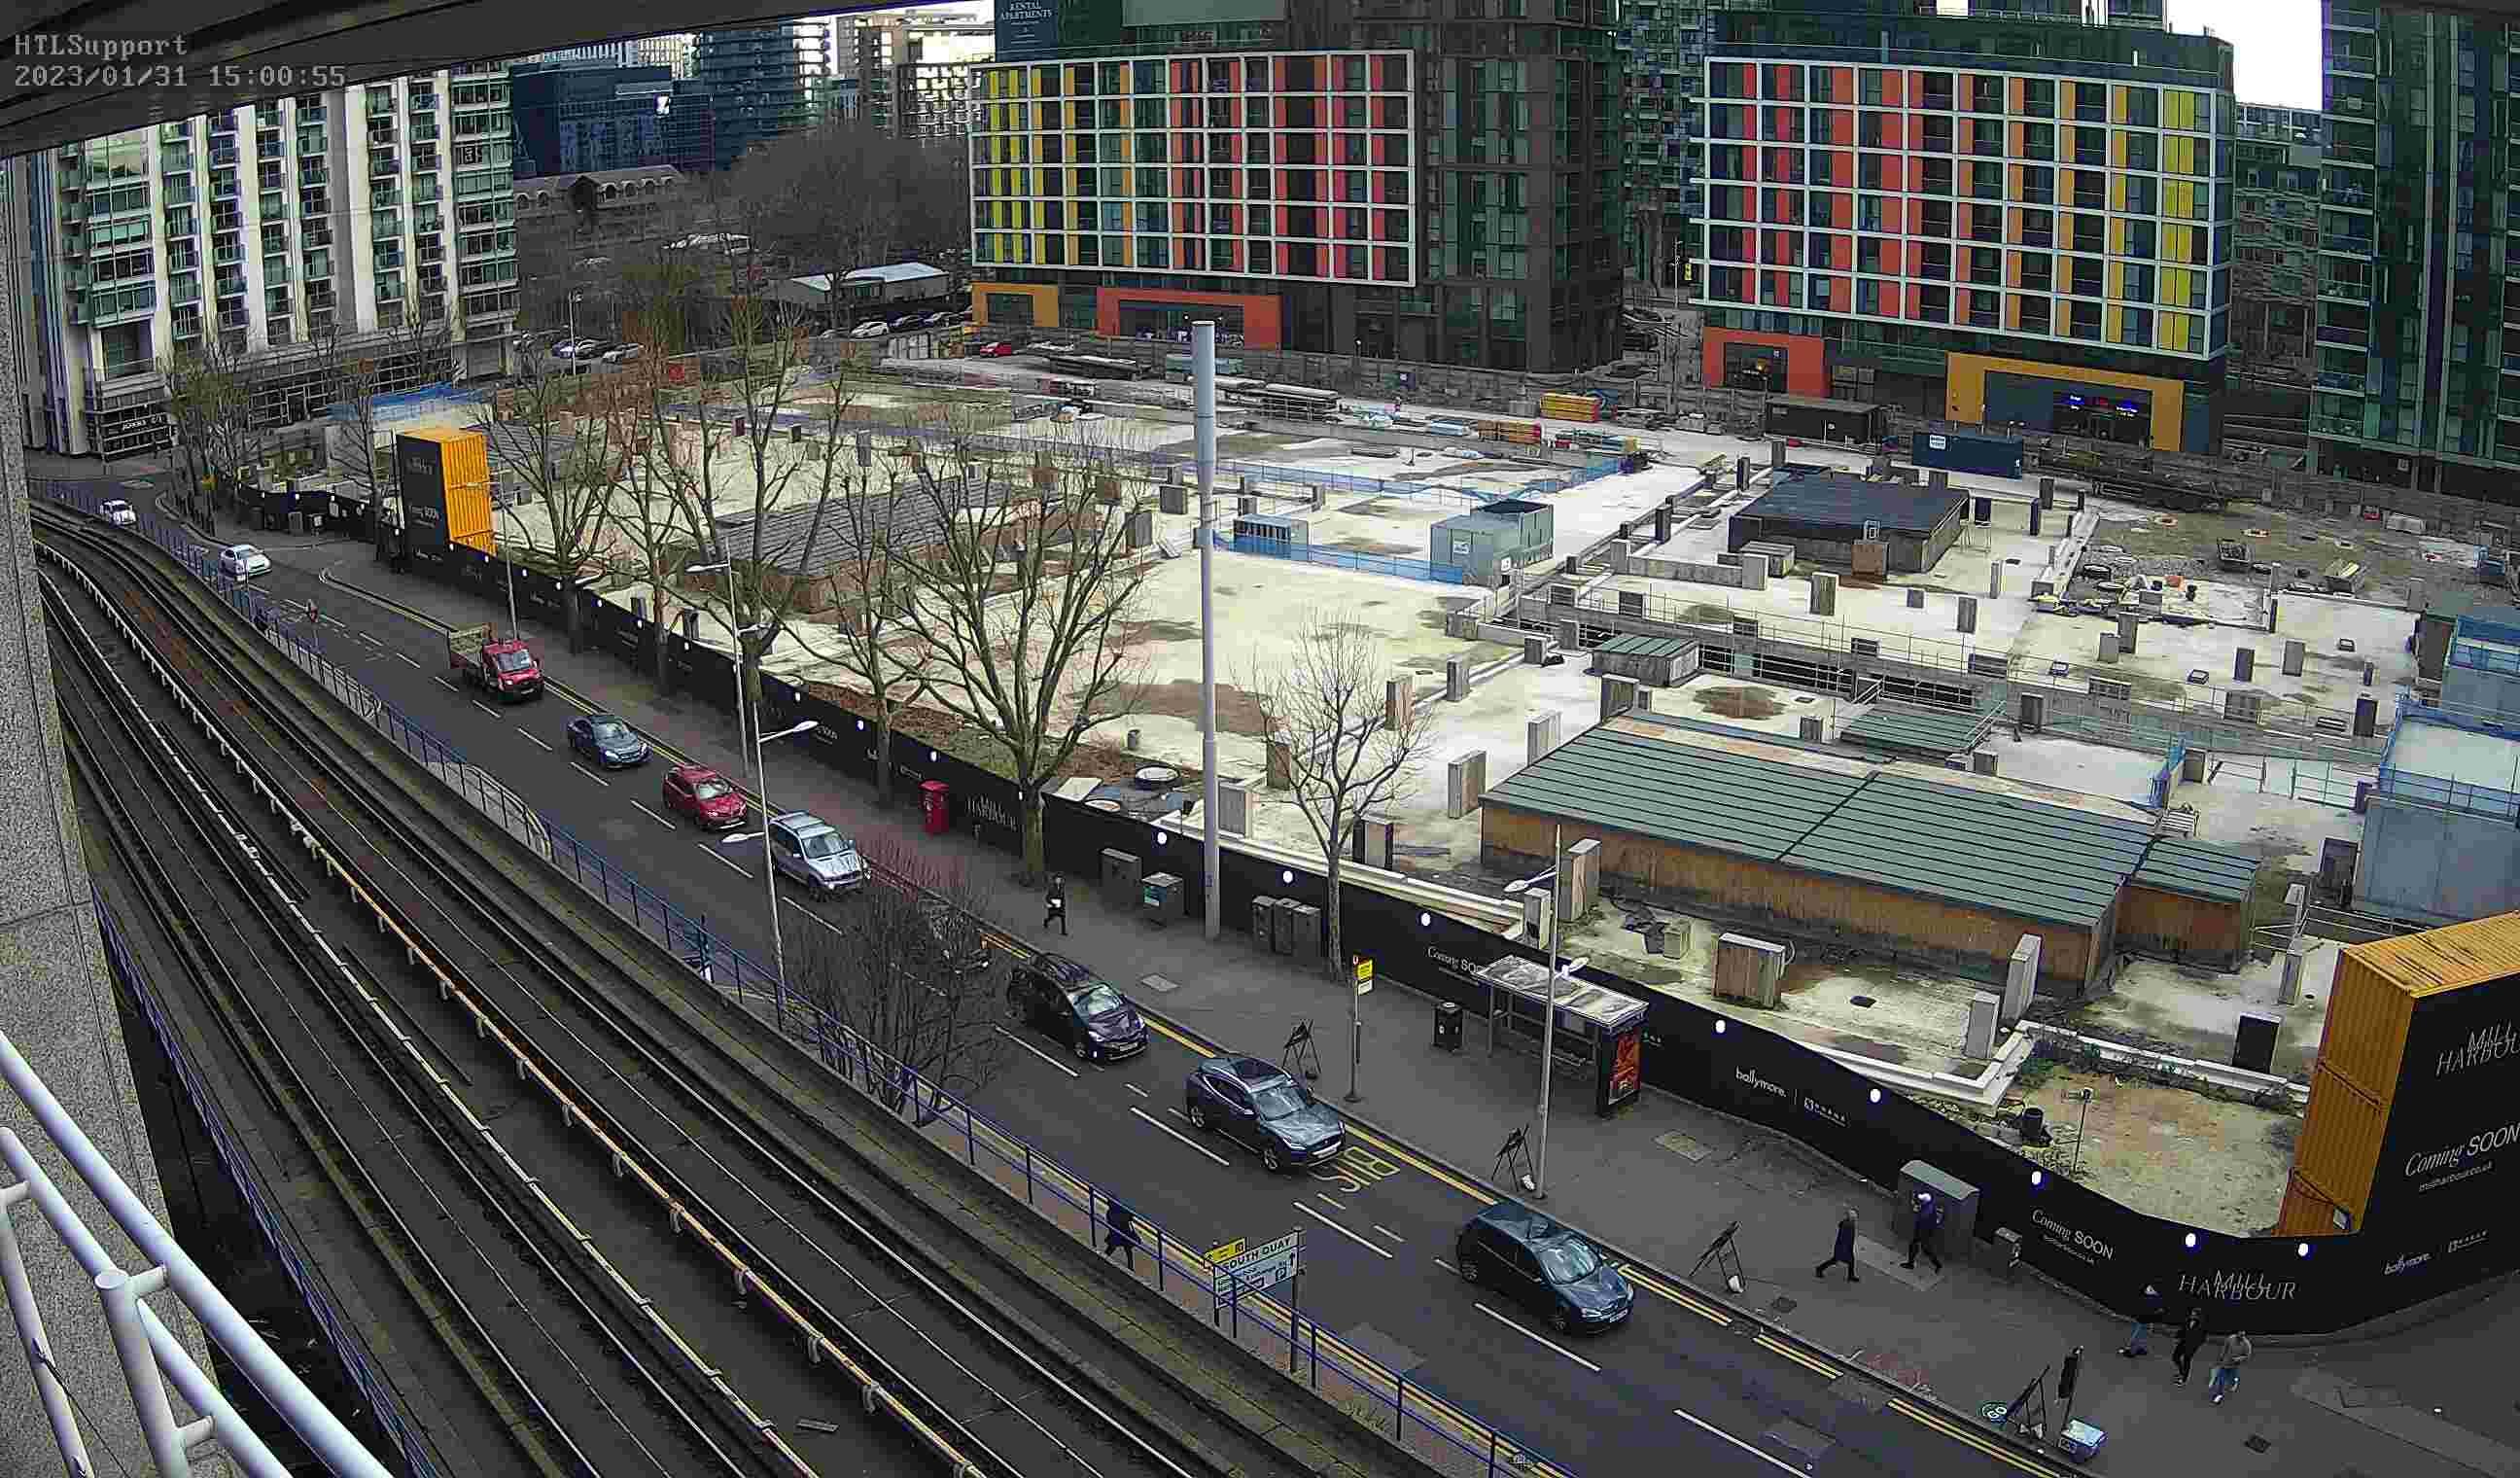 Webcam: London Docklands, Londra, Inghilterra